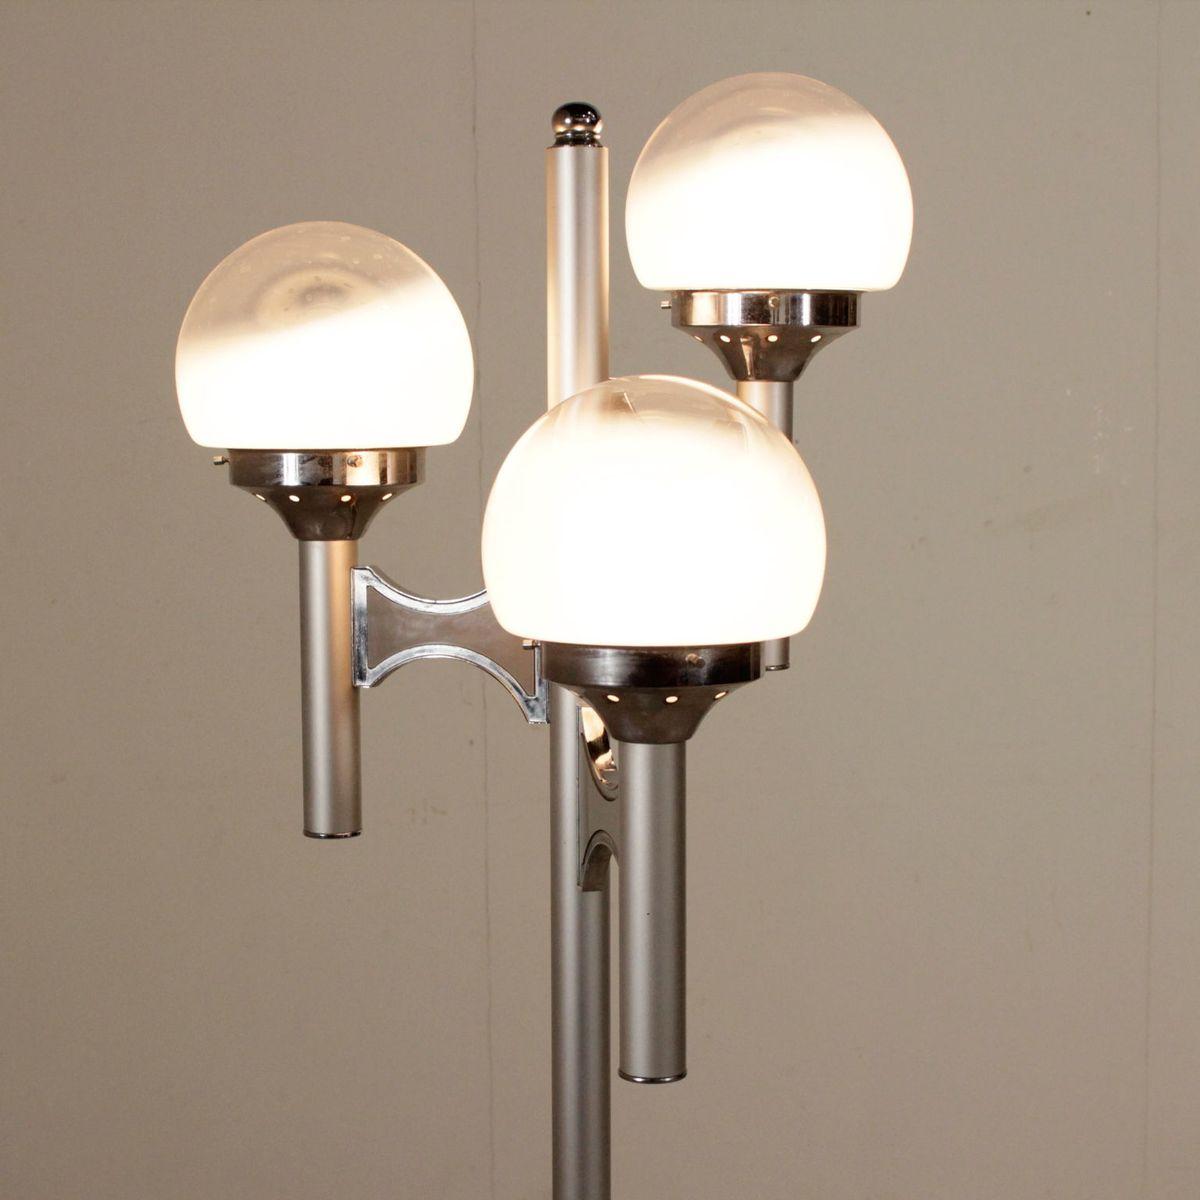 vintage stehlampe aus aluminium metall glas bei pamono. Black Bedroom Furniture Sets. Home Design Ideas